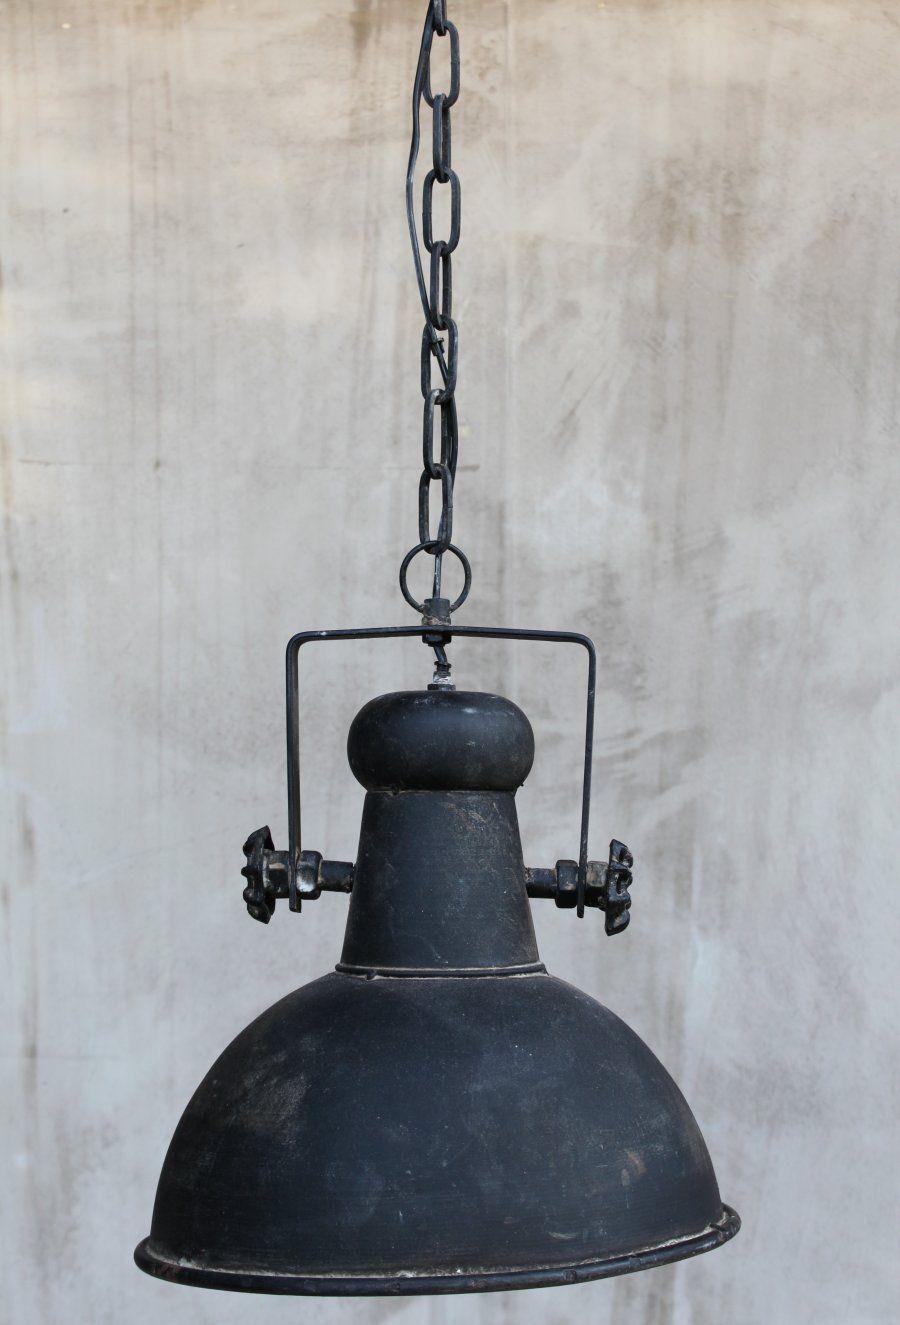 Industrielampe Lampe modern Design Deckenlampe Hngelampe